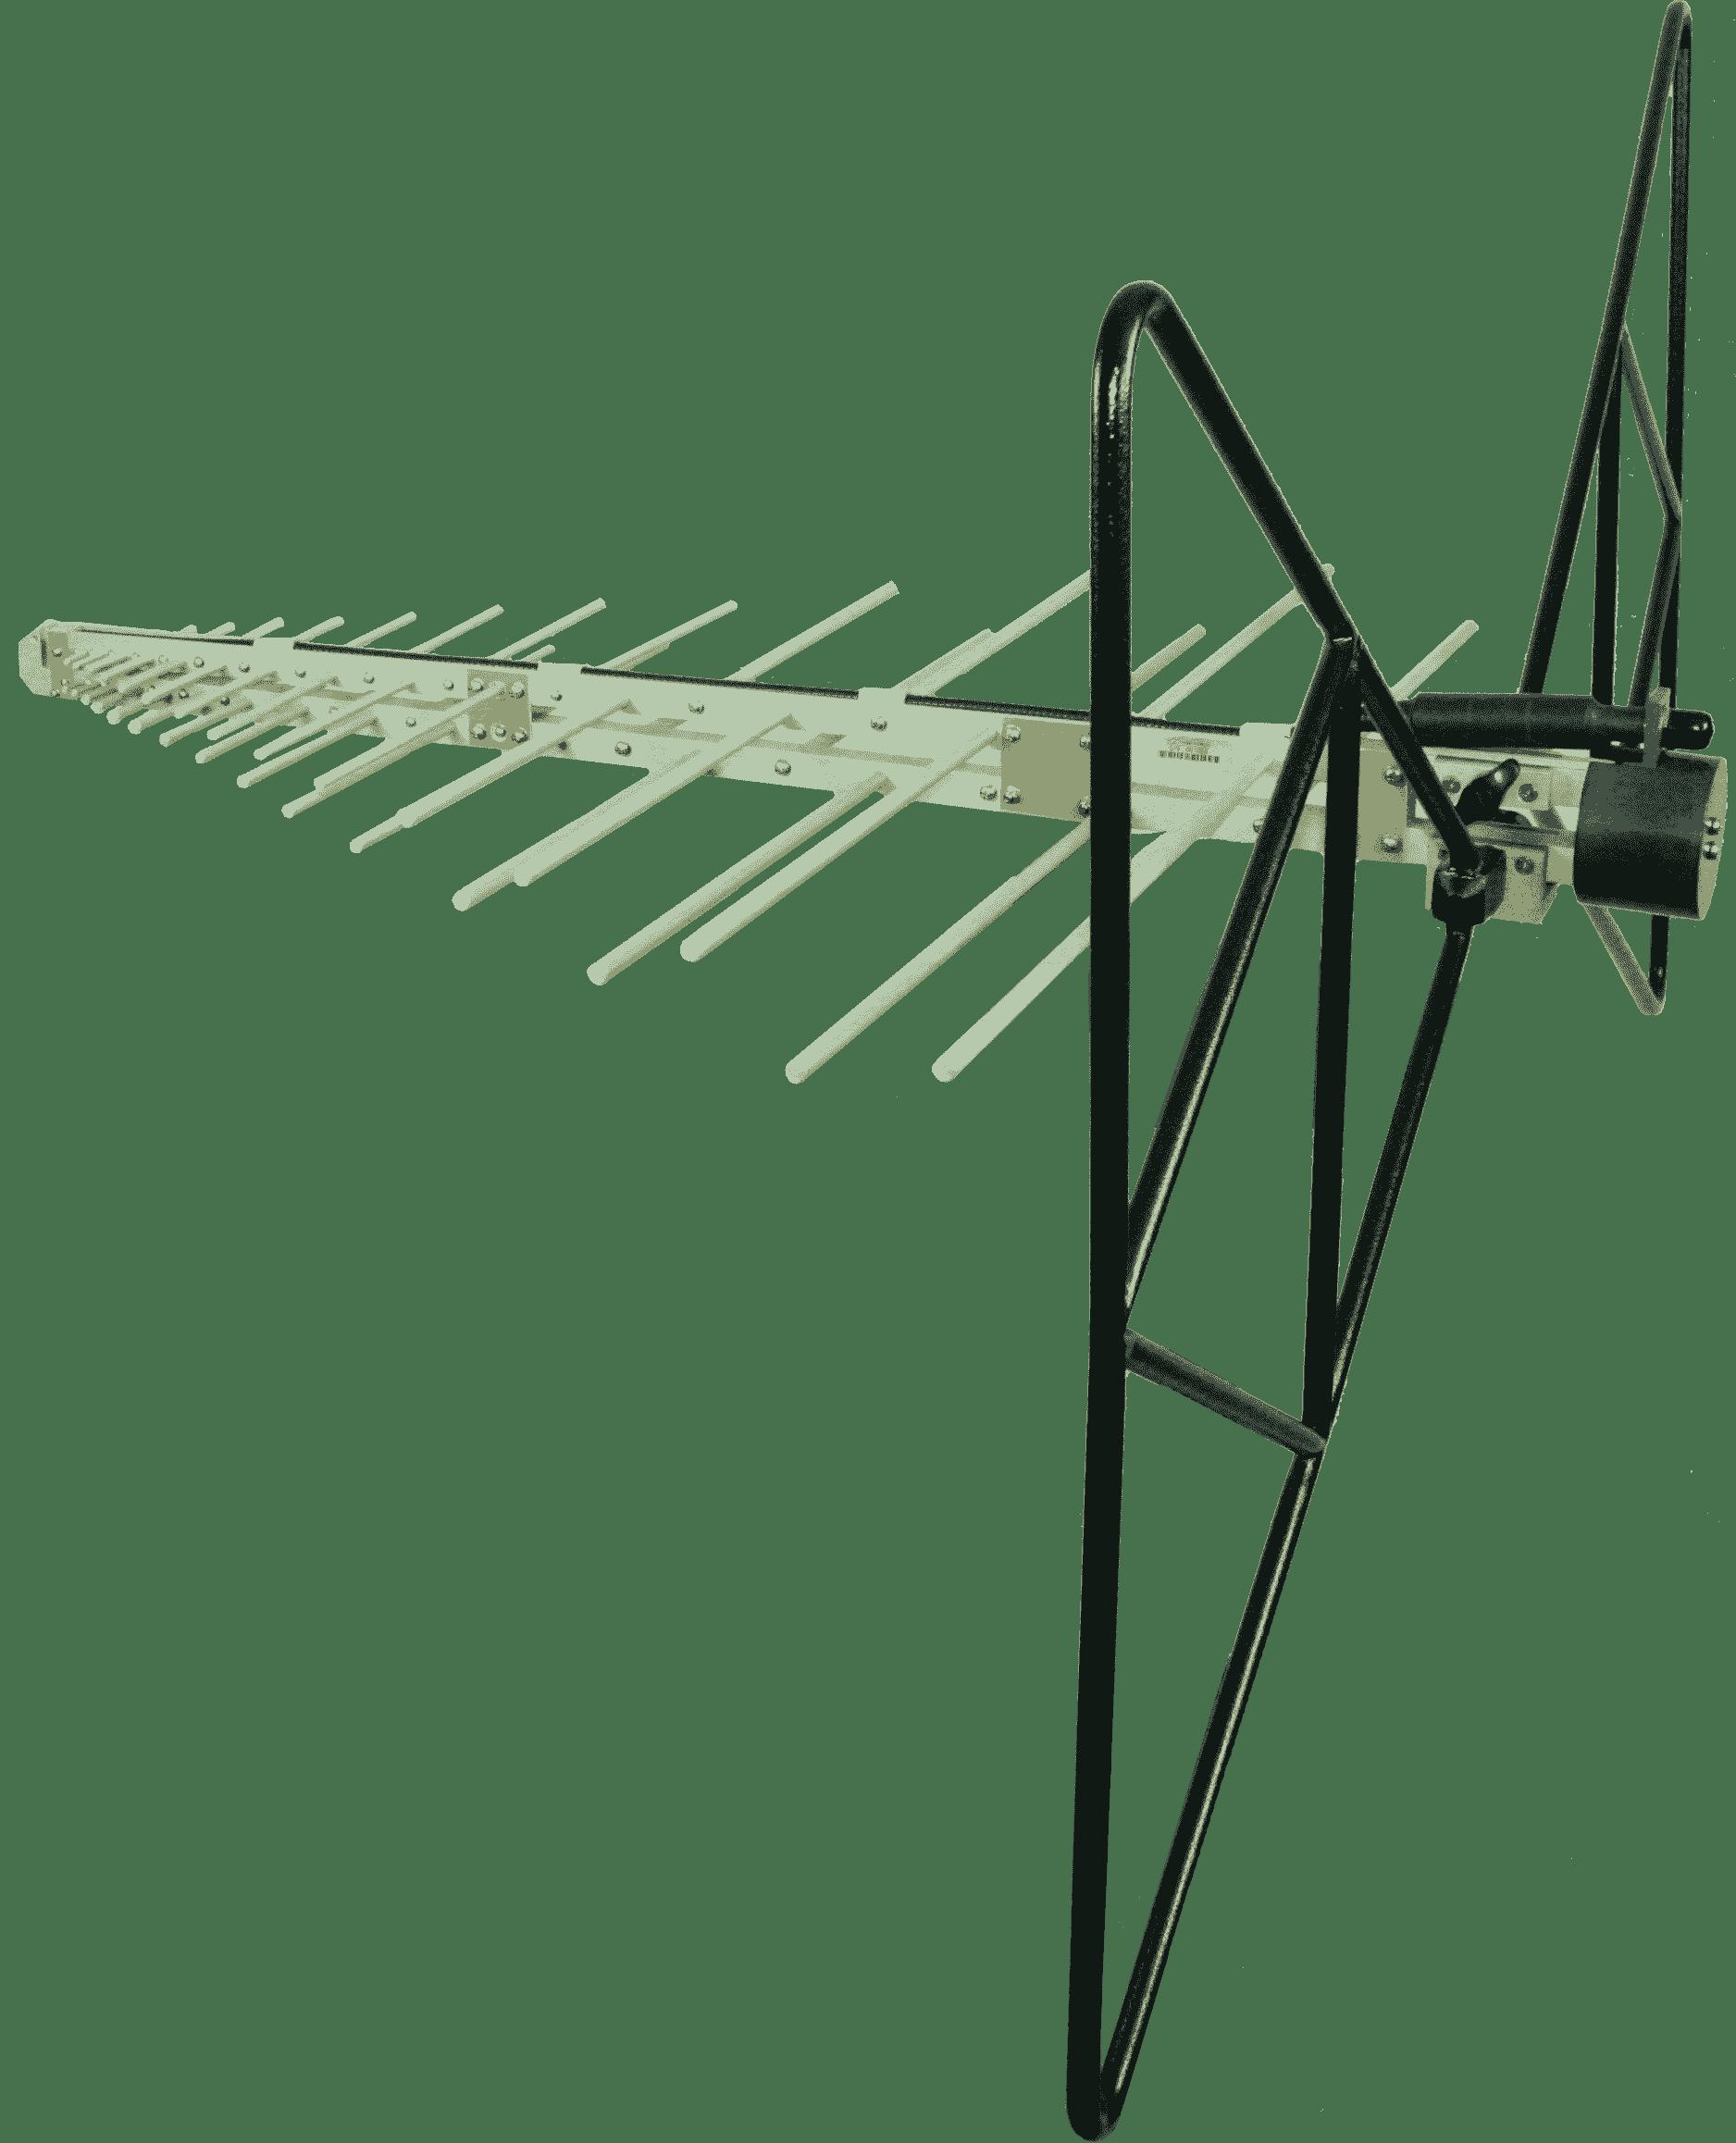 broadband combilog antenna